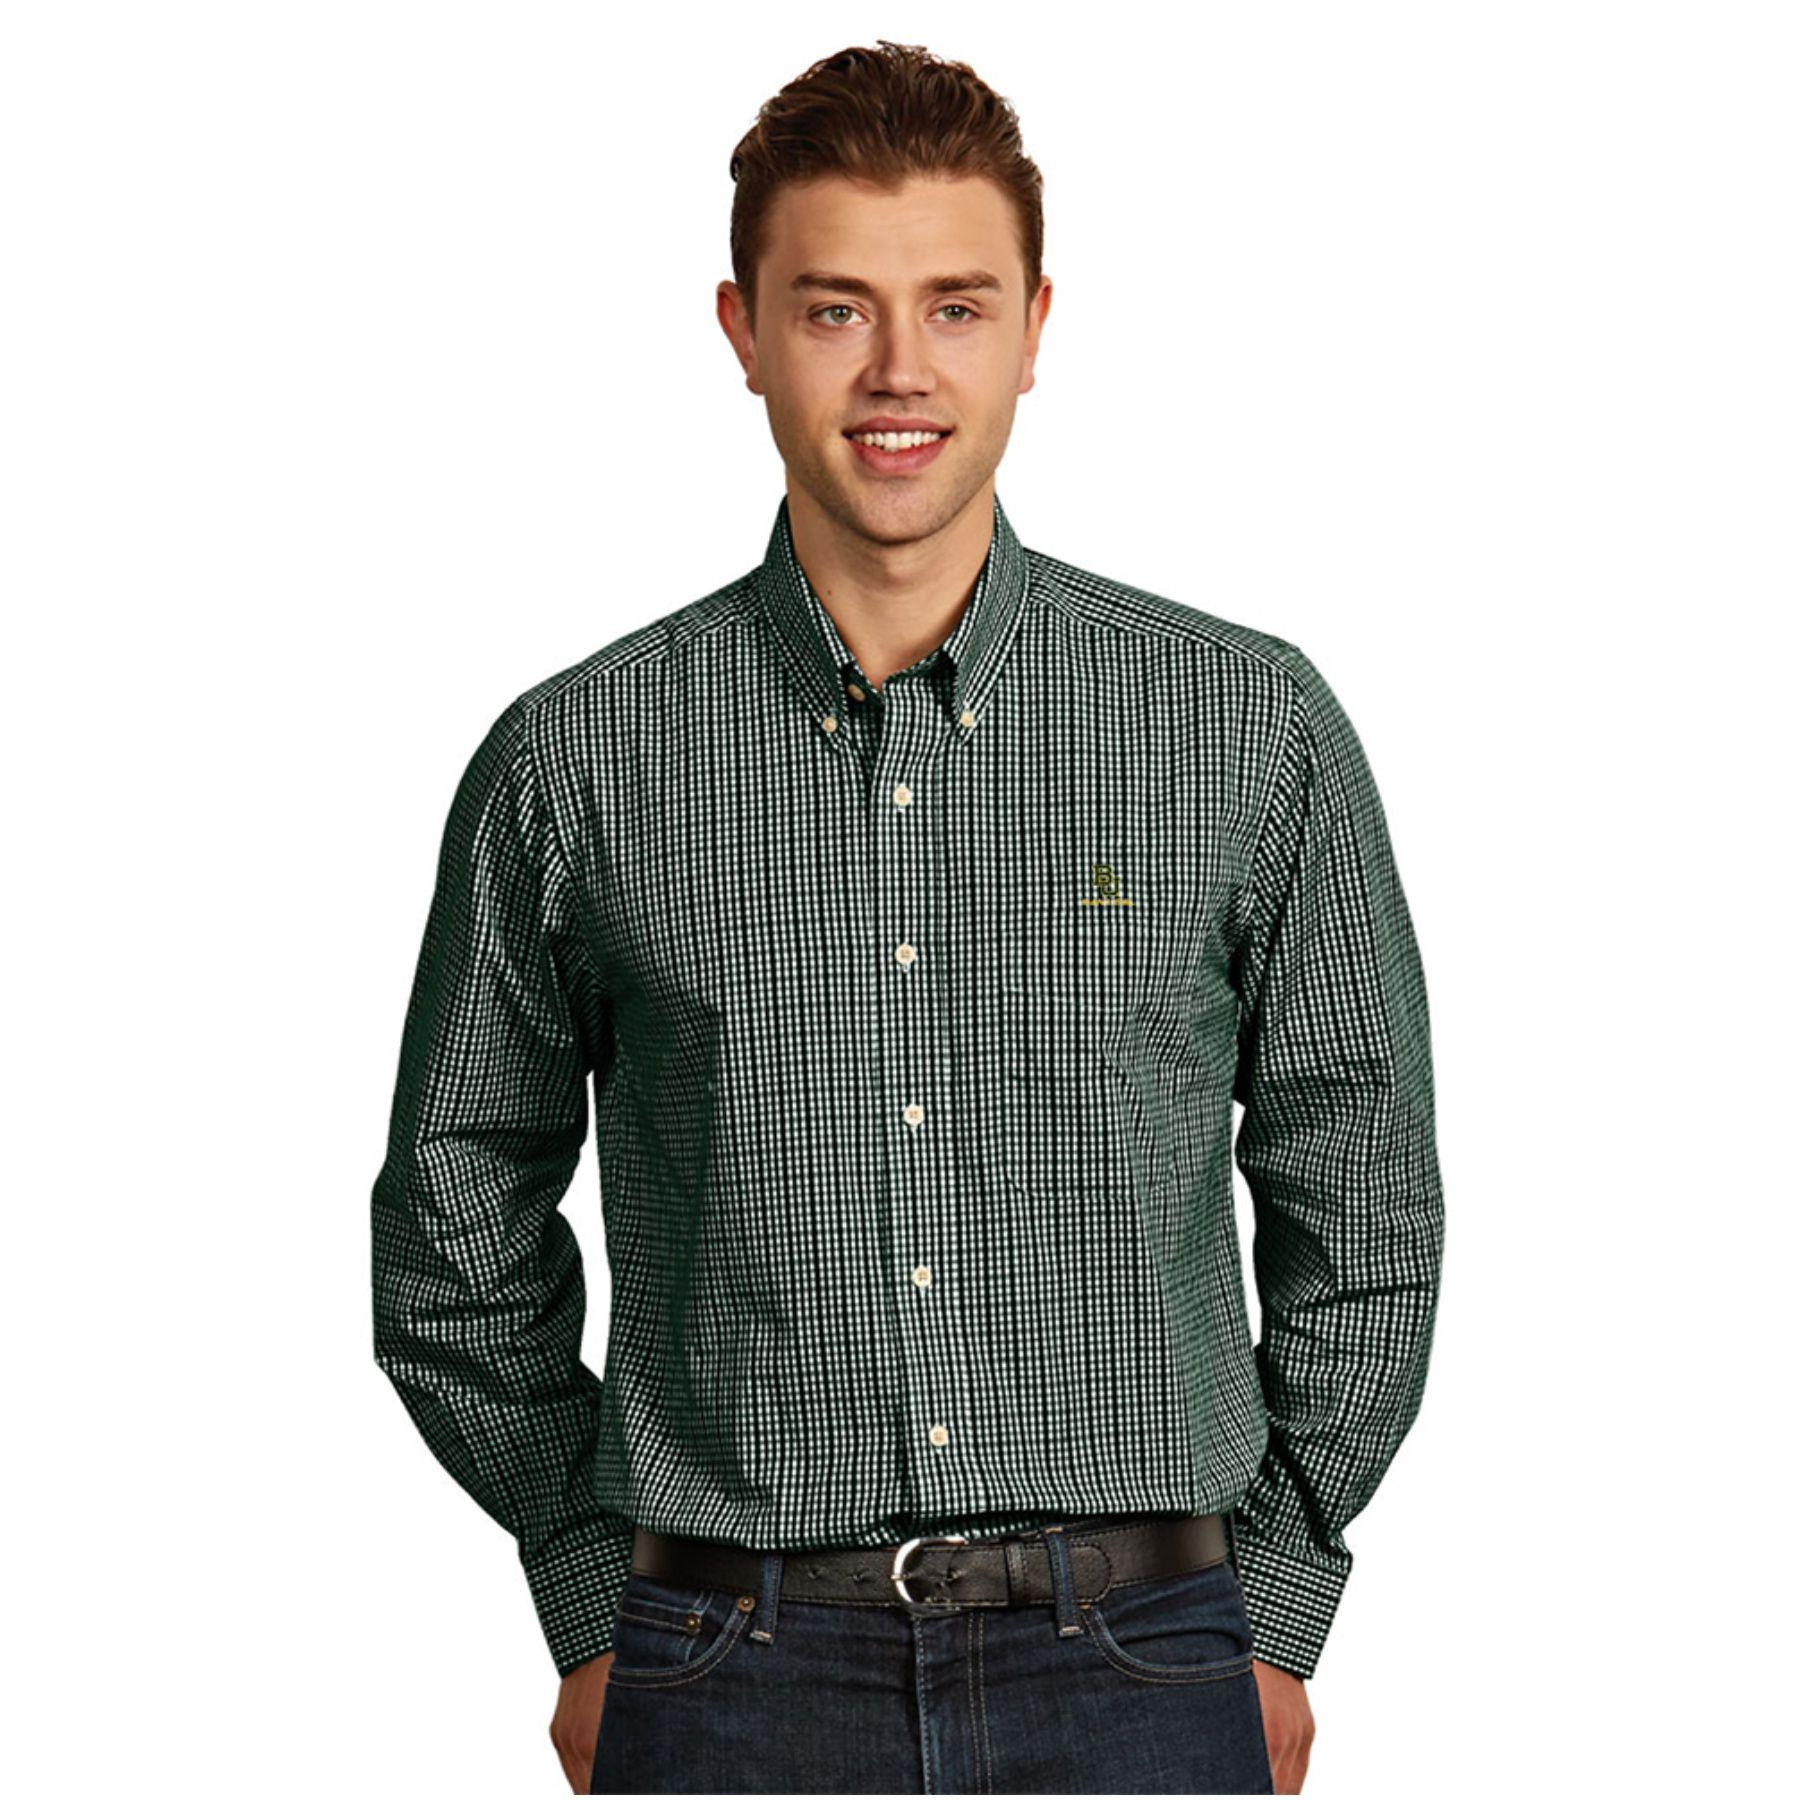 Baylor Bears Ncaa Monarch Men S Long Sleeve Shirt Dark Pine Small Long Sleeve Shirt Men Long Sleeve Shirts Shirt Dress [ 1800 x 1800 Pixel ]